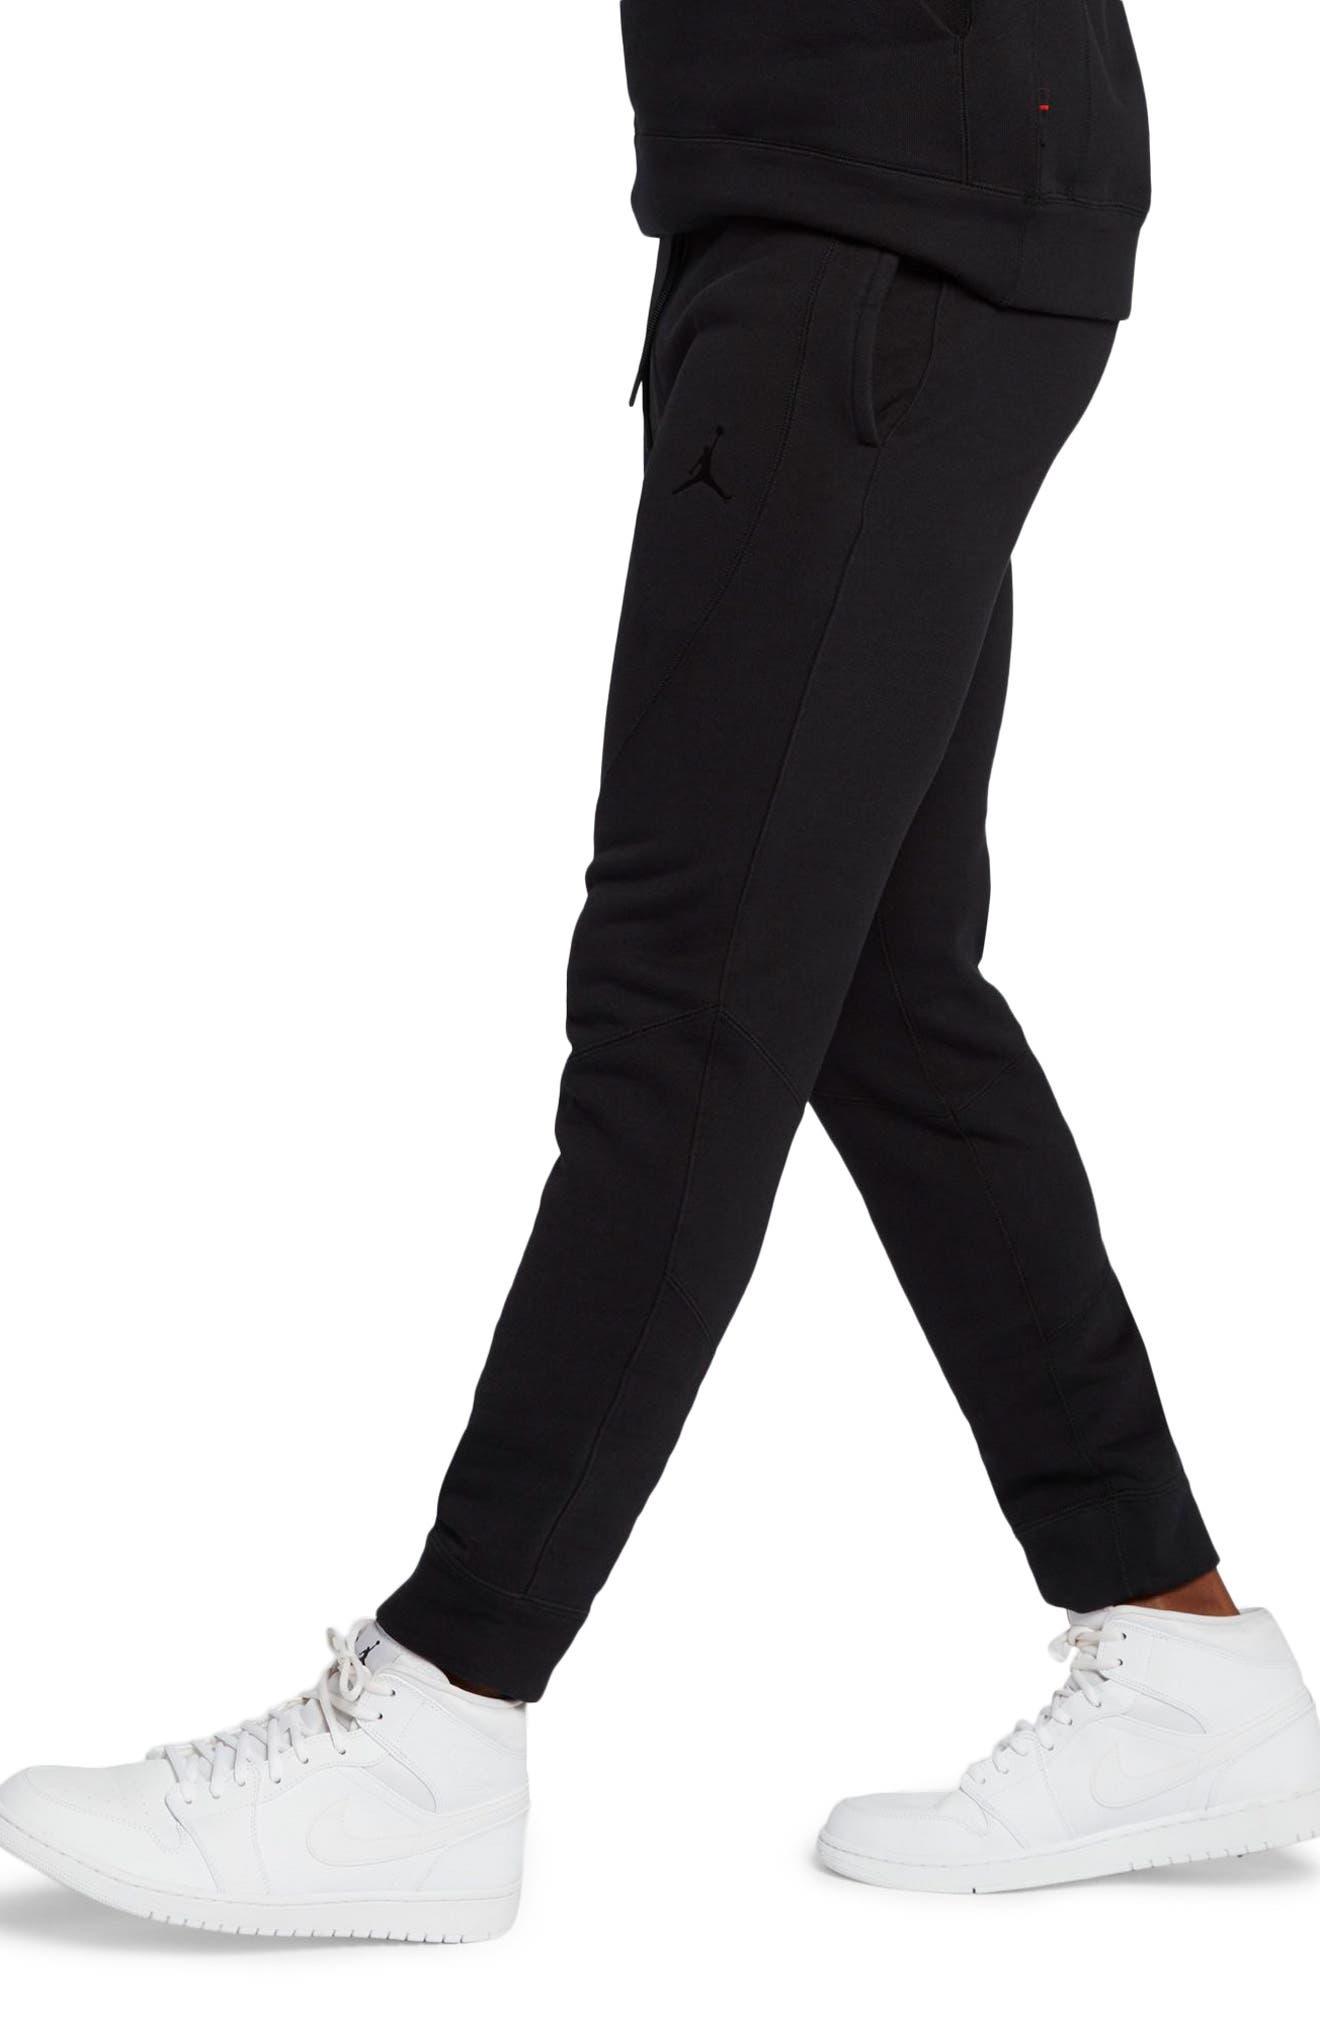 Wings Fleece Pants,                             Alternate thumbnail 3, color,                             Black/ Black